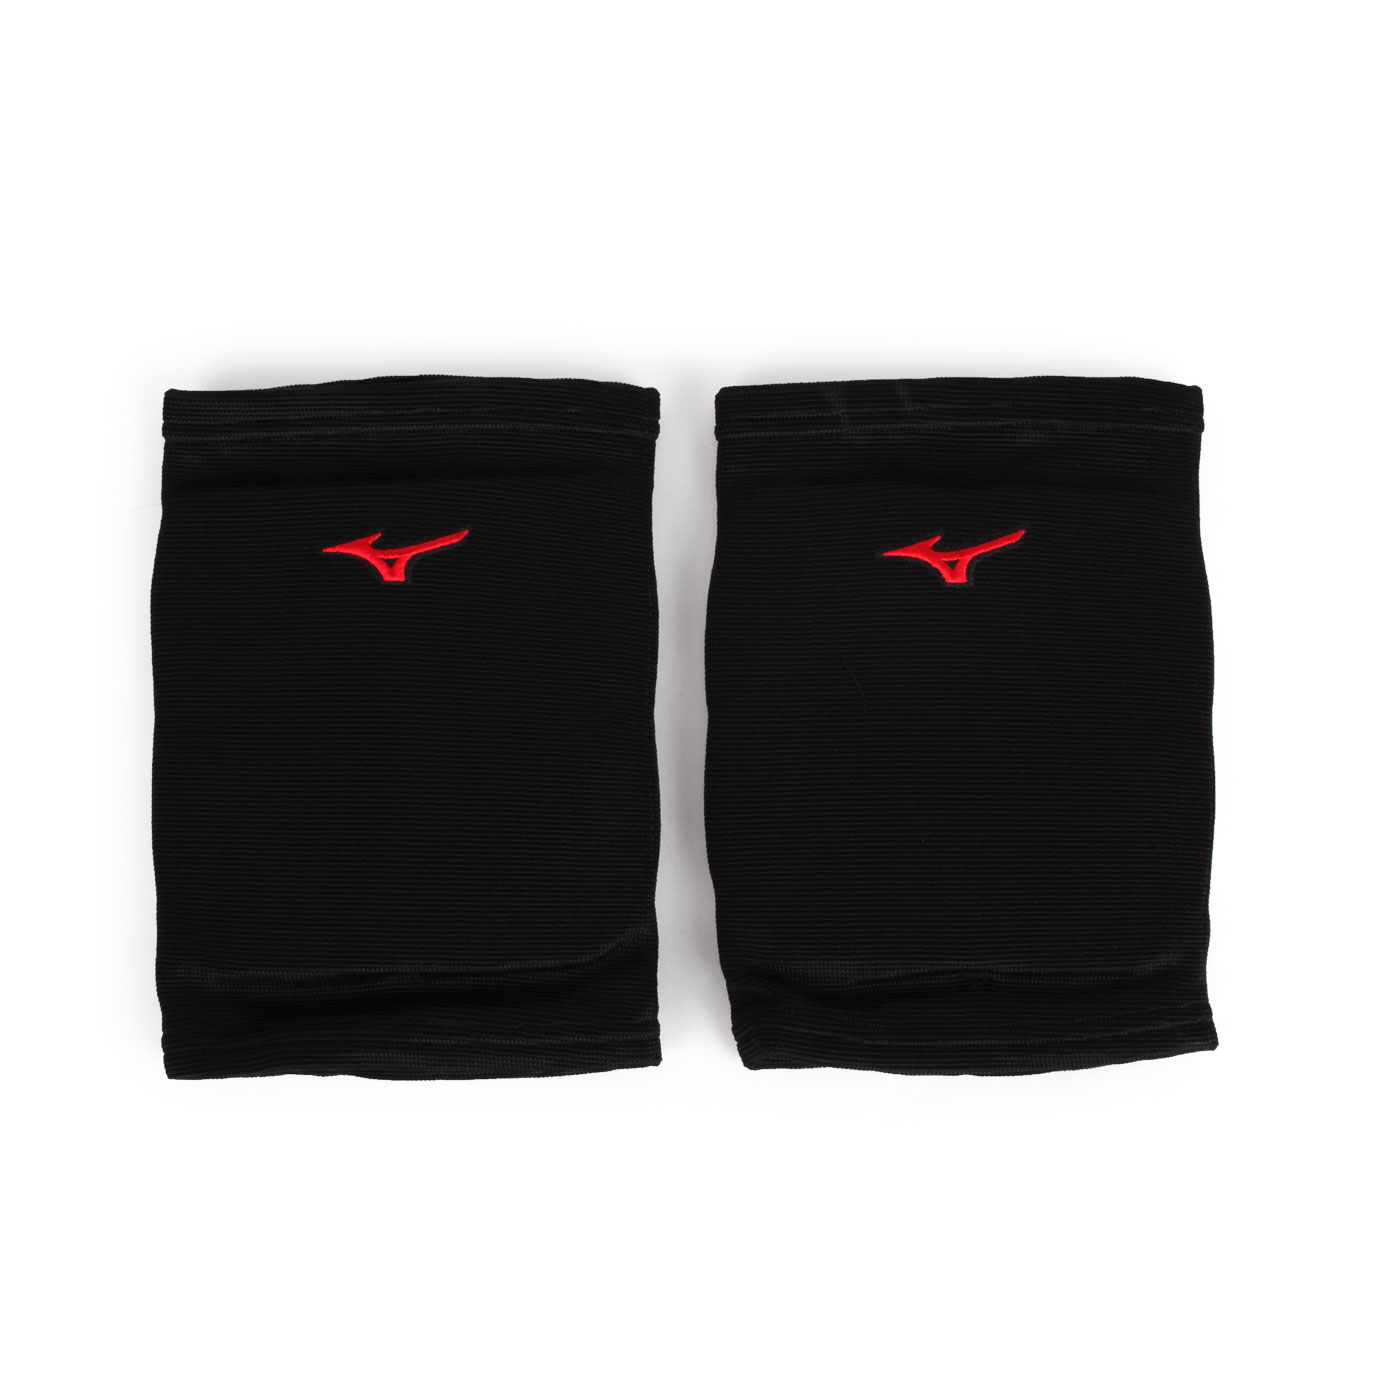 MIZUNO 成人用護膝 V2TY800609 - 黑紅